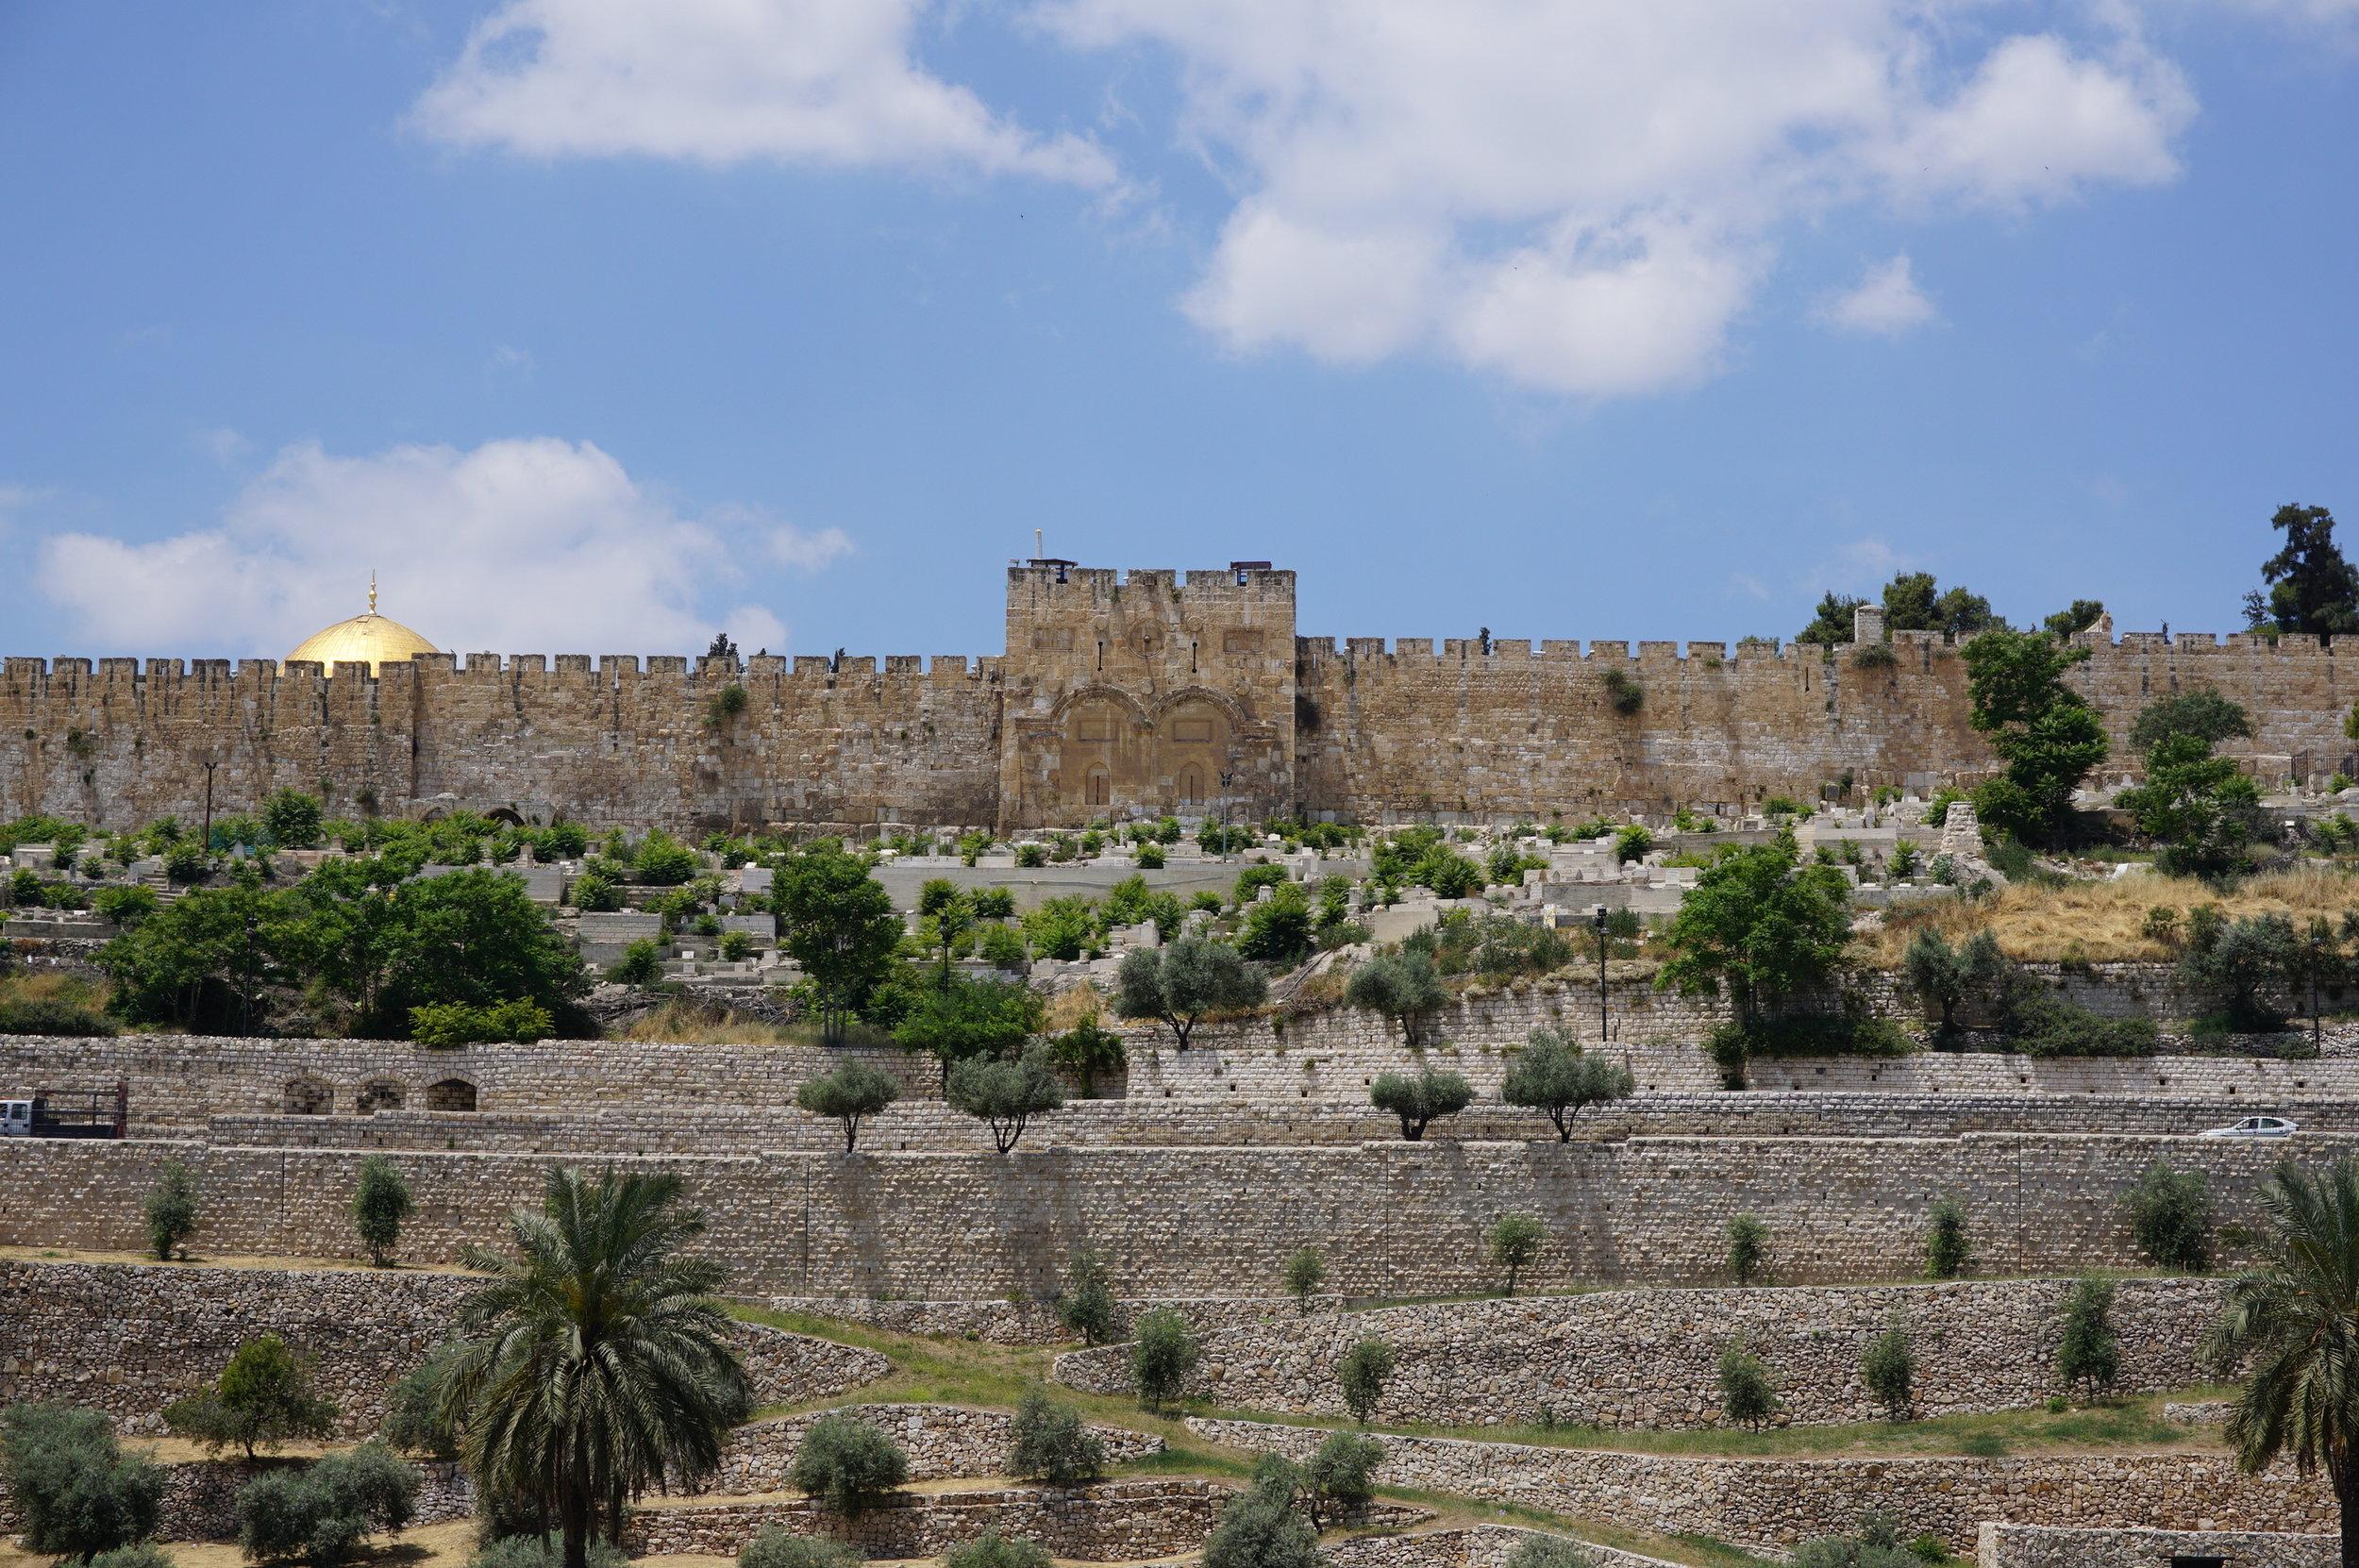 East Gate from the Garden of Gethsemane Jerusalem Israel.JPG